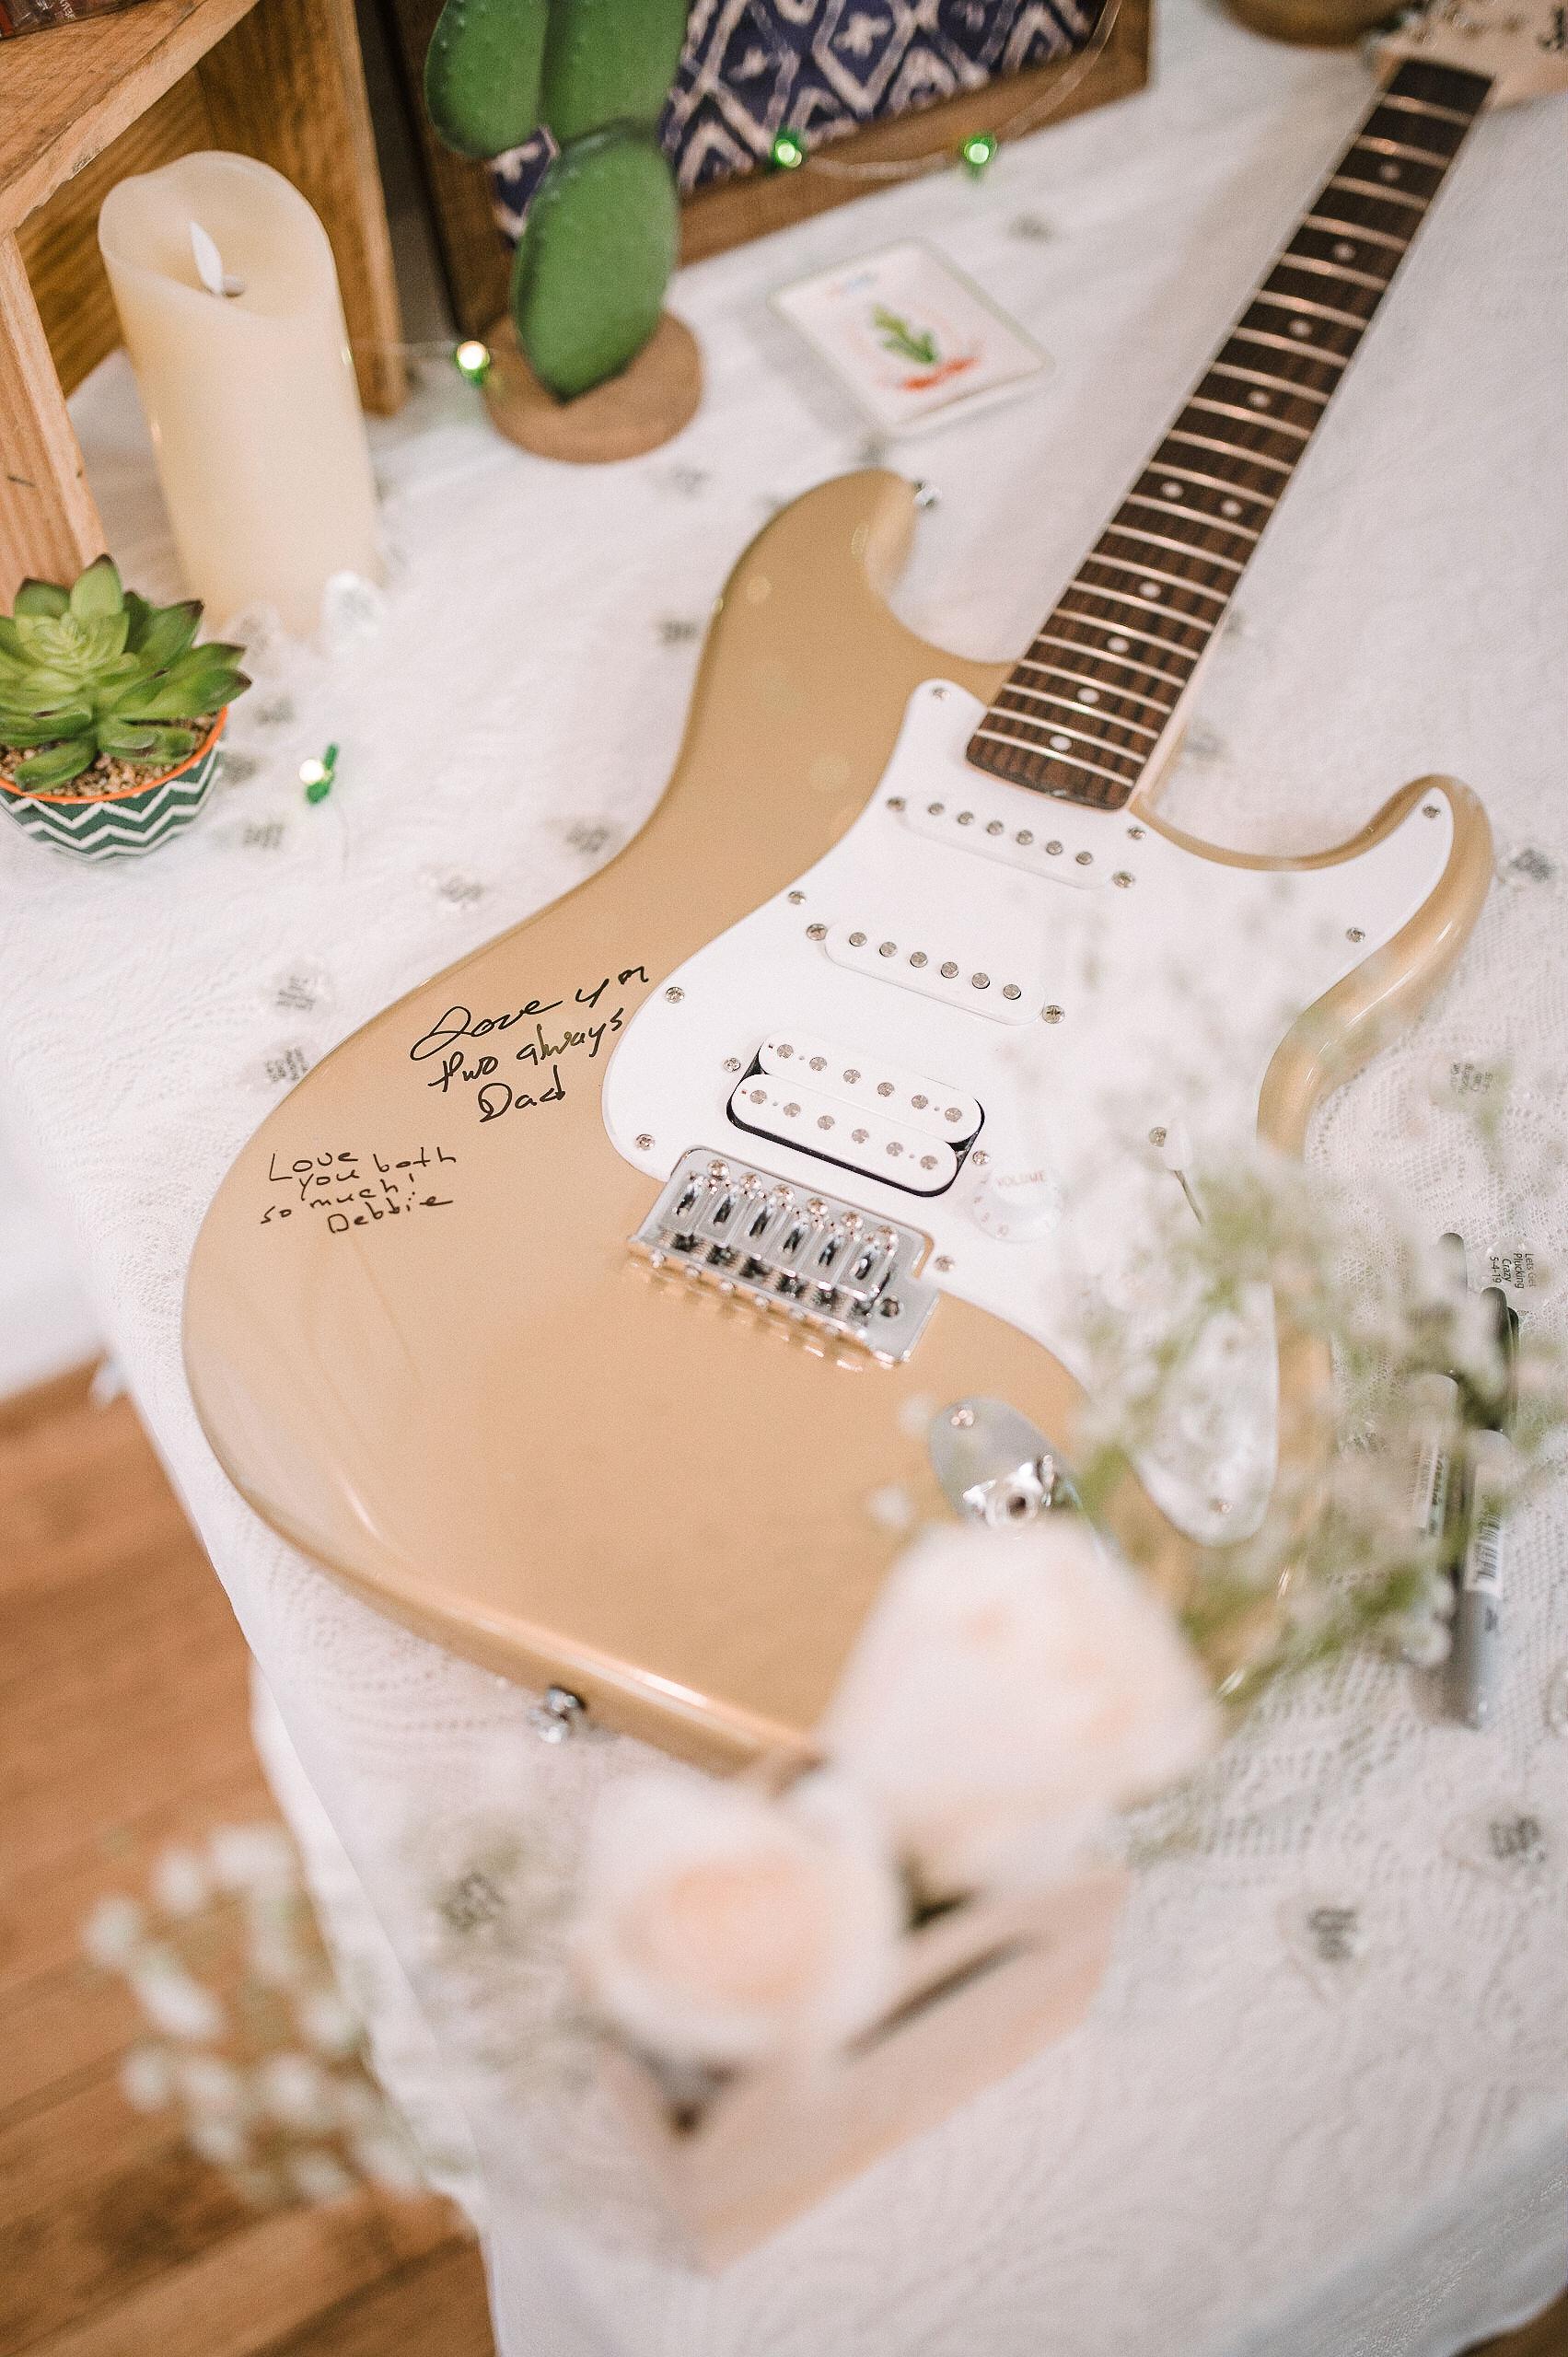 reception guitar details for wedding reception at MAVFC Reception Hall